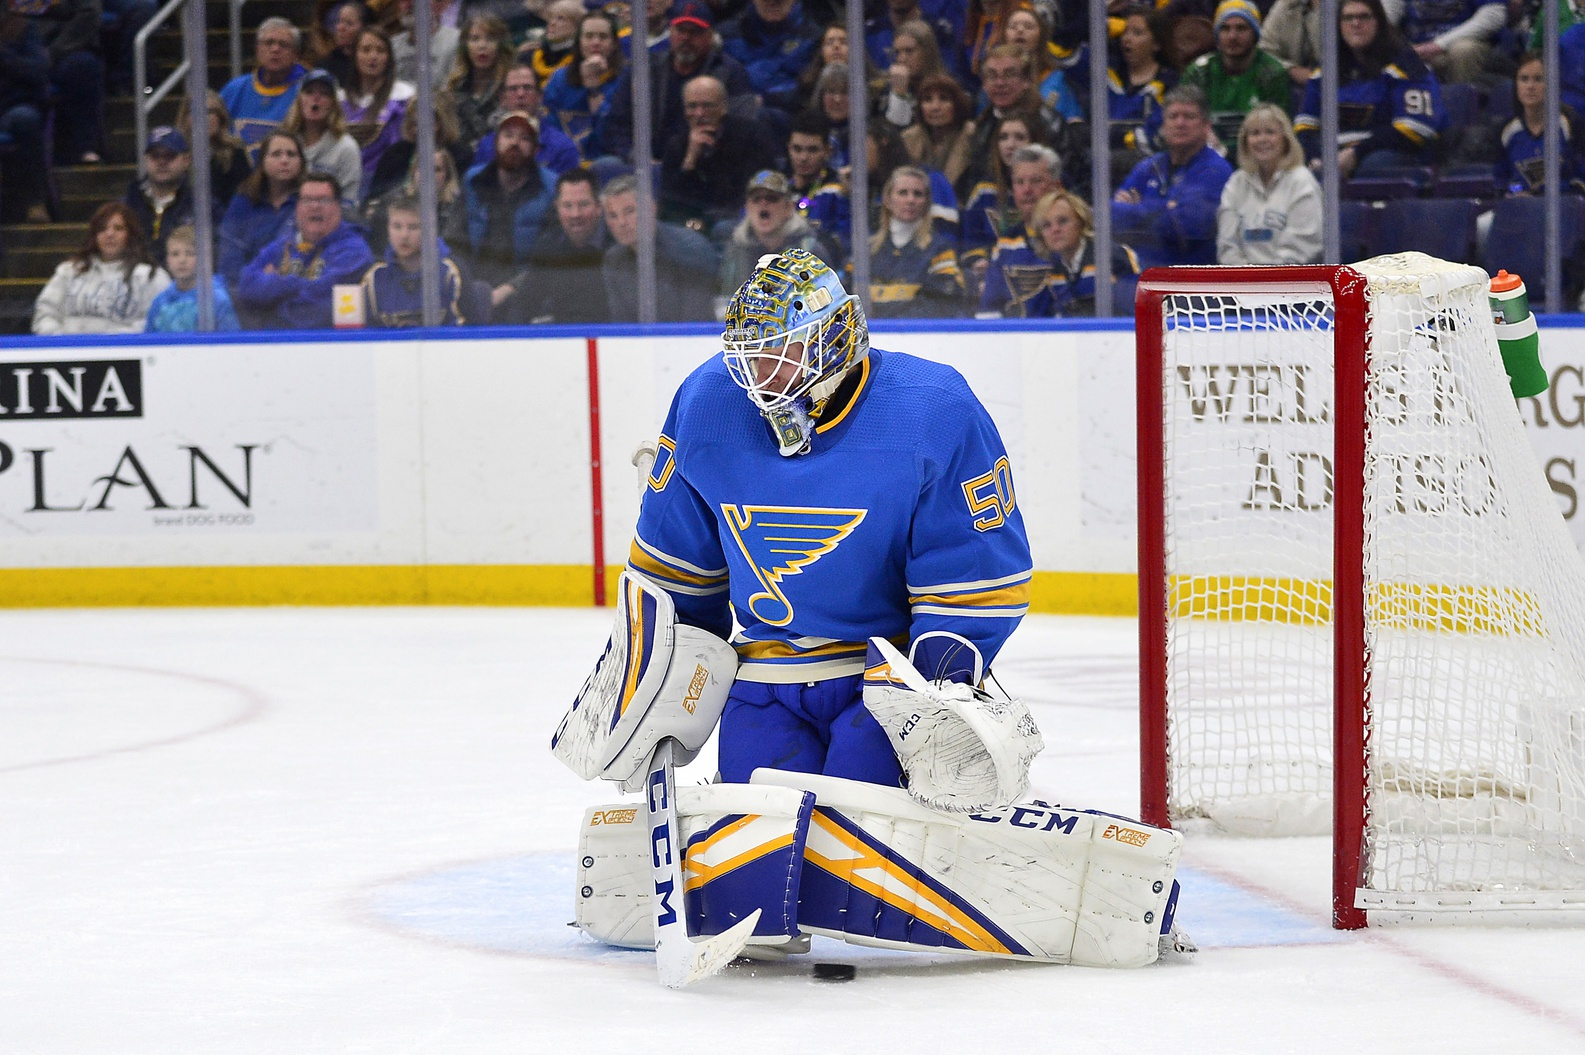 Jordan Binnington officially among the NHL's league leaders